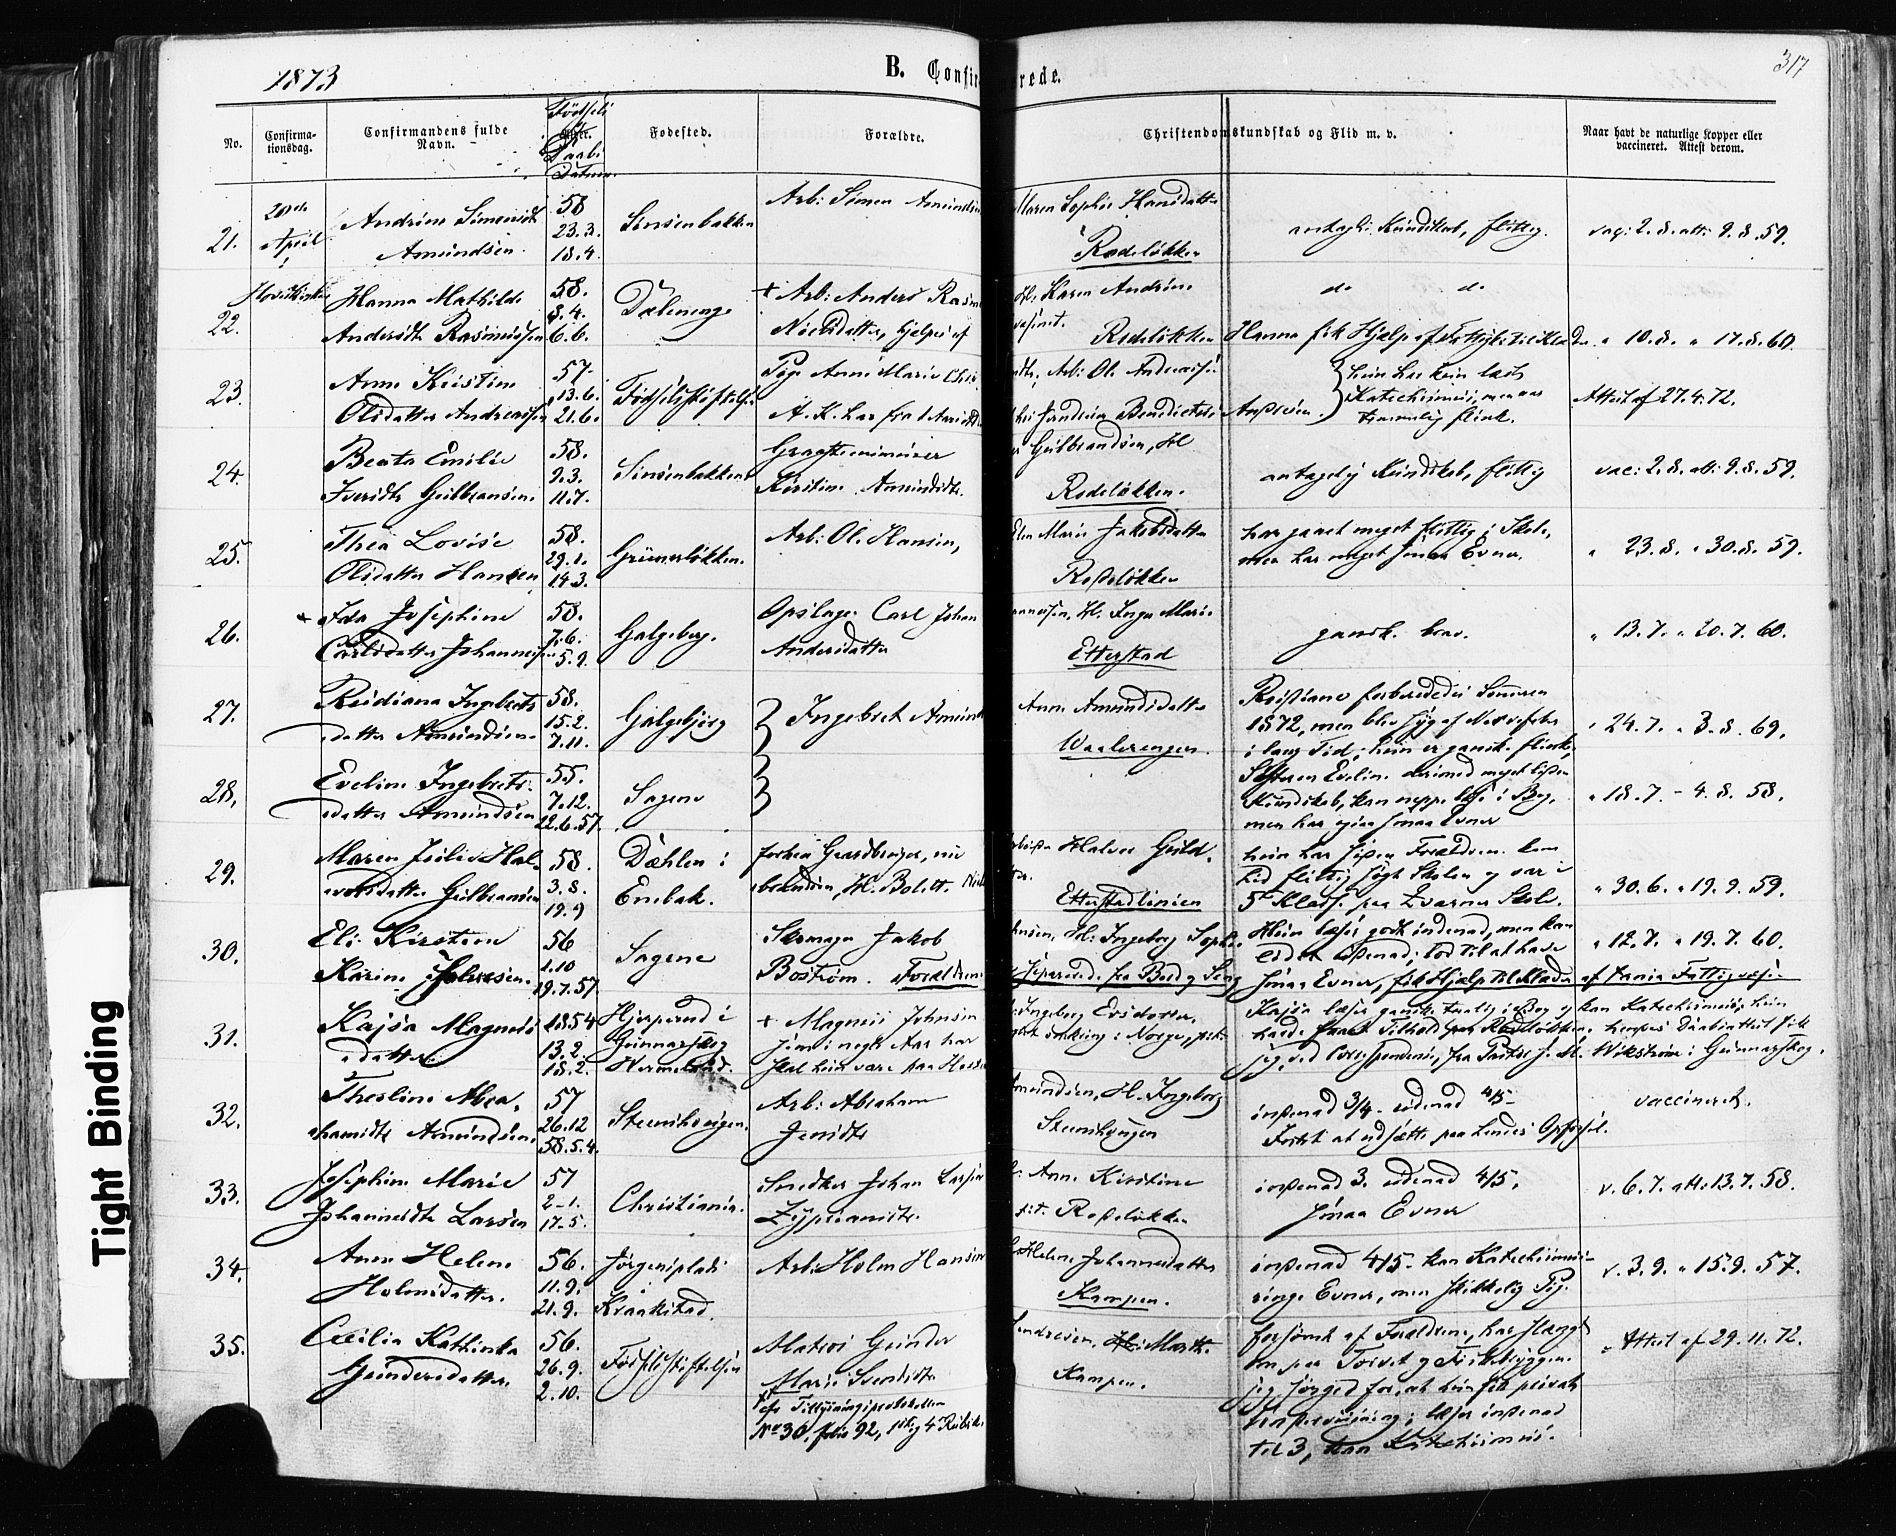 SAO, Østre Aker prestekontor Kirkebøker, F/Fa/L0003: Ministerialbok nr. I 3, 1869-1875, s. 317